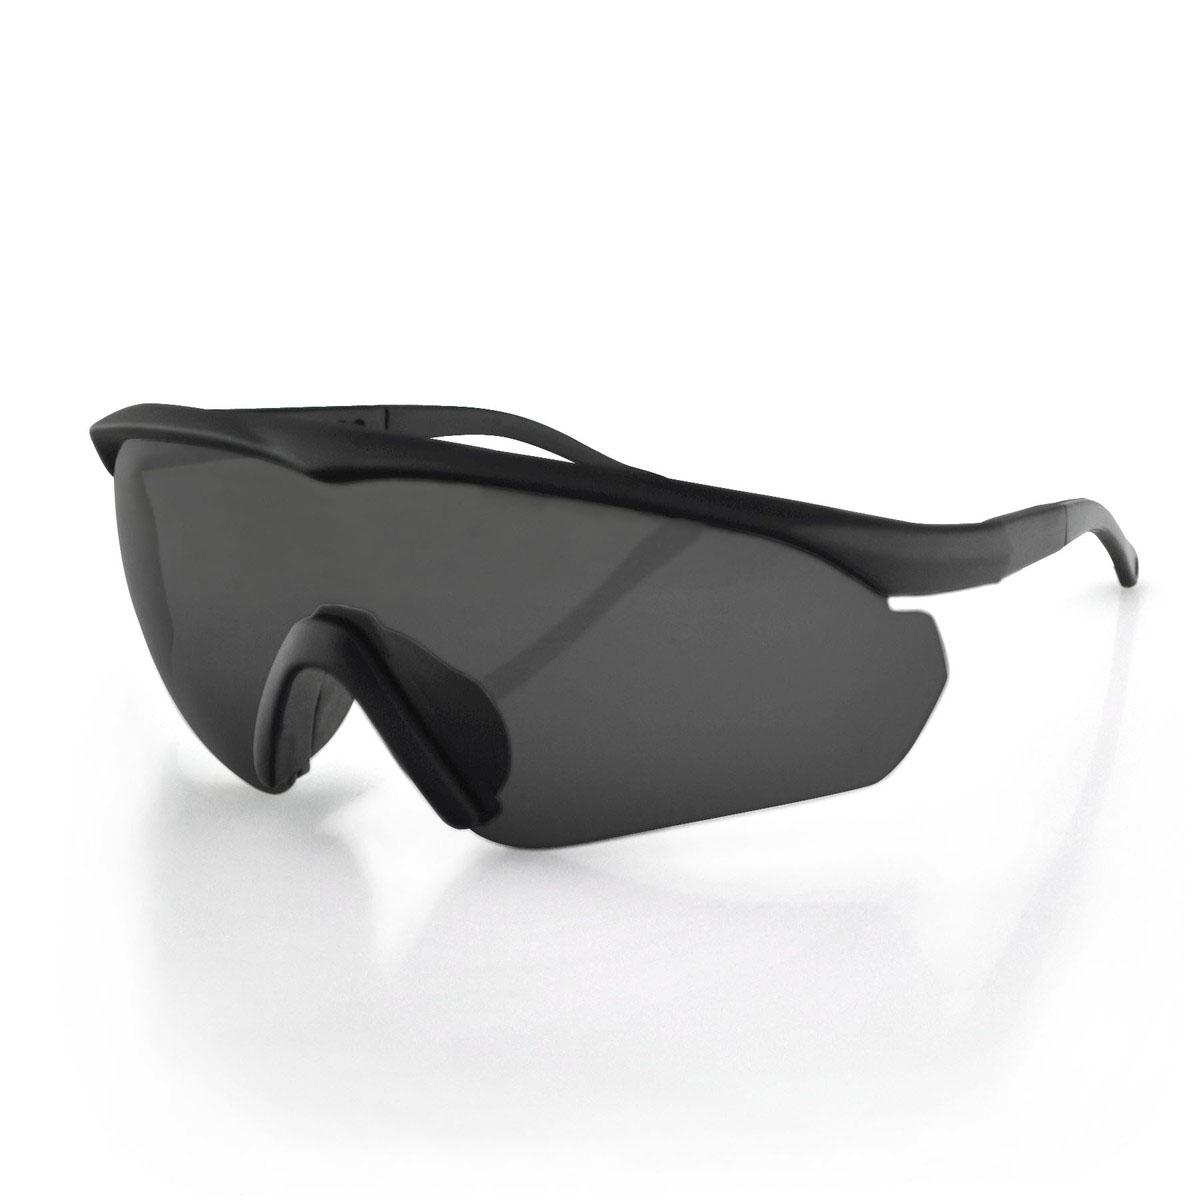 6f1d2f99cf235 Bobster Delta Small Sunglasses